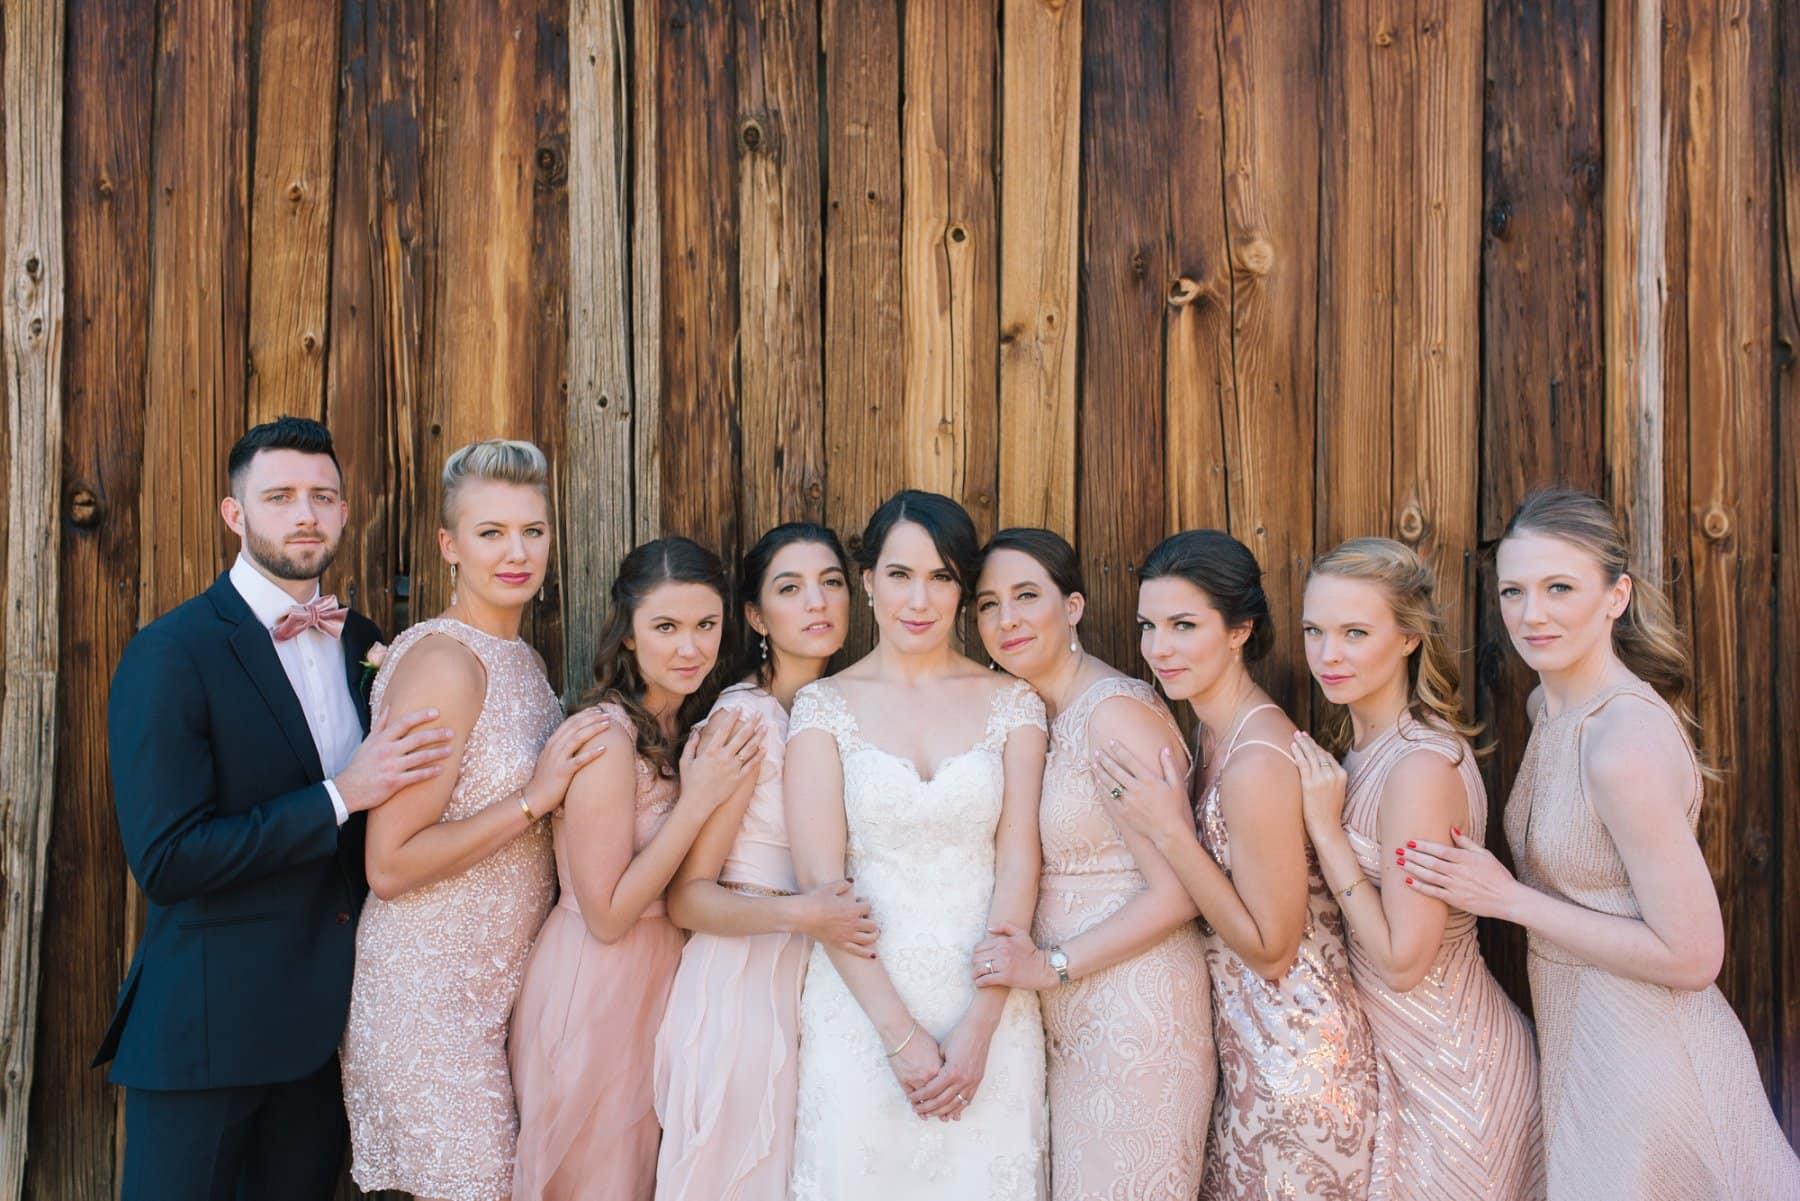 Desert Foothills wedding party pink bridesmaids dresses and bridesman